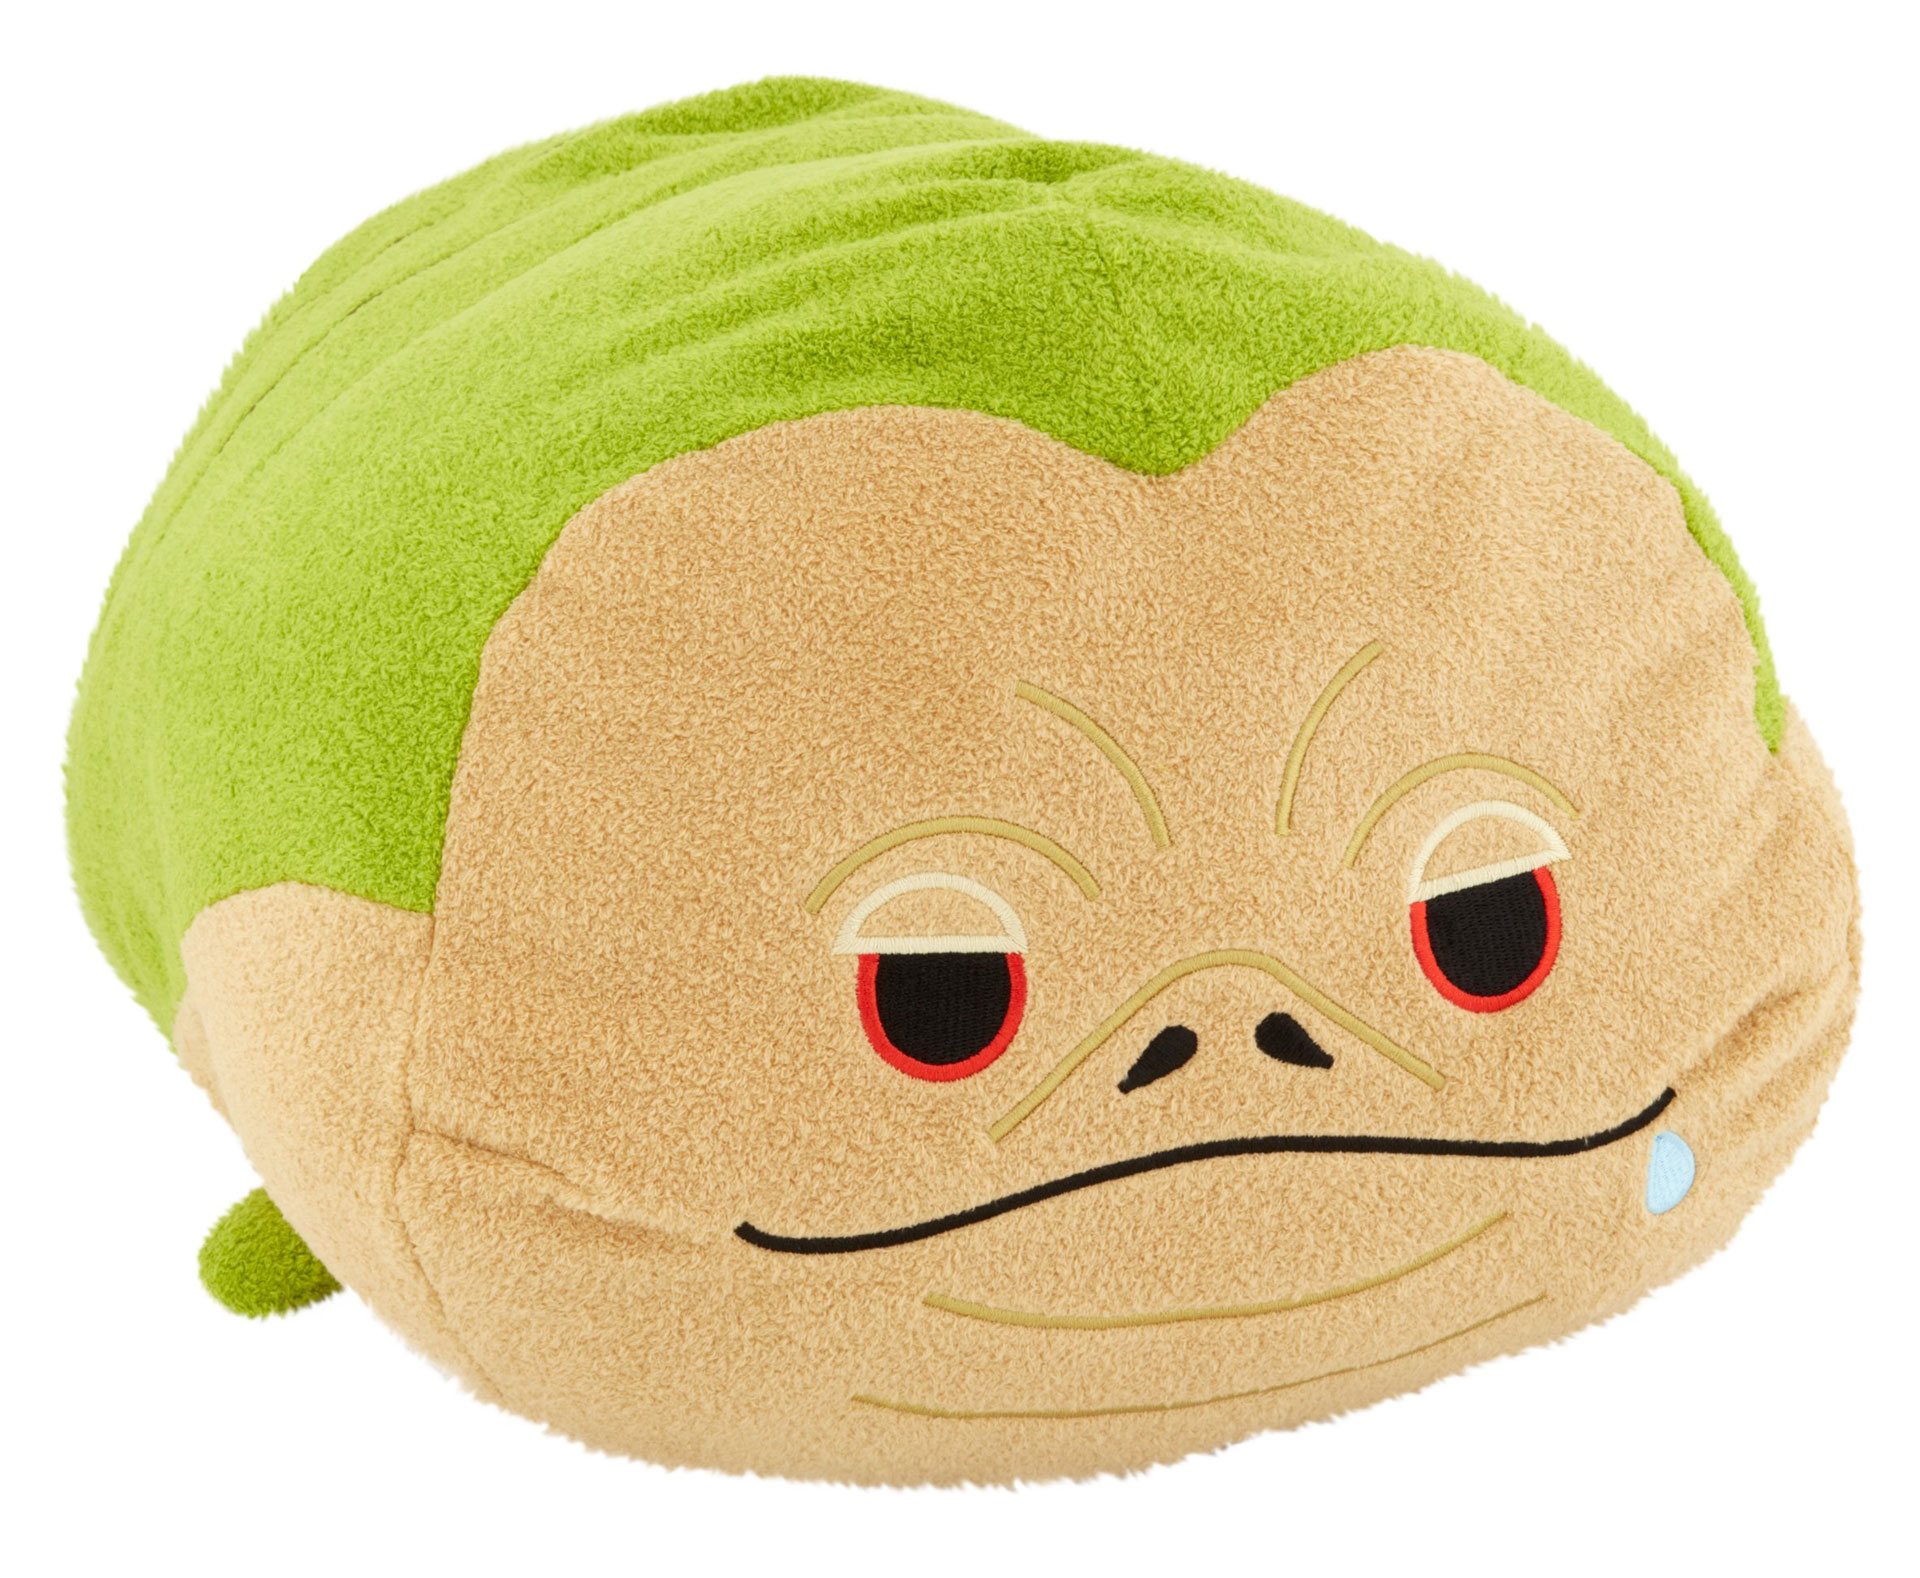 Star Wars Jabba The Hutt 20 Plush Toy